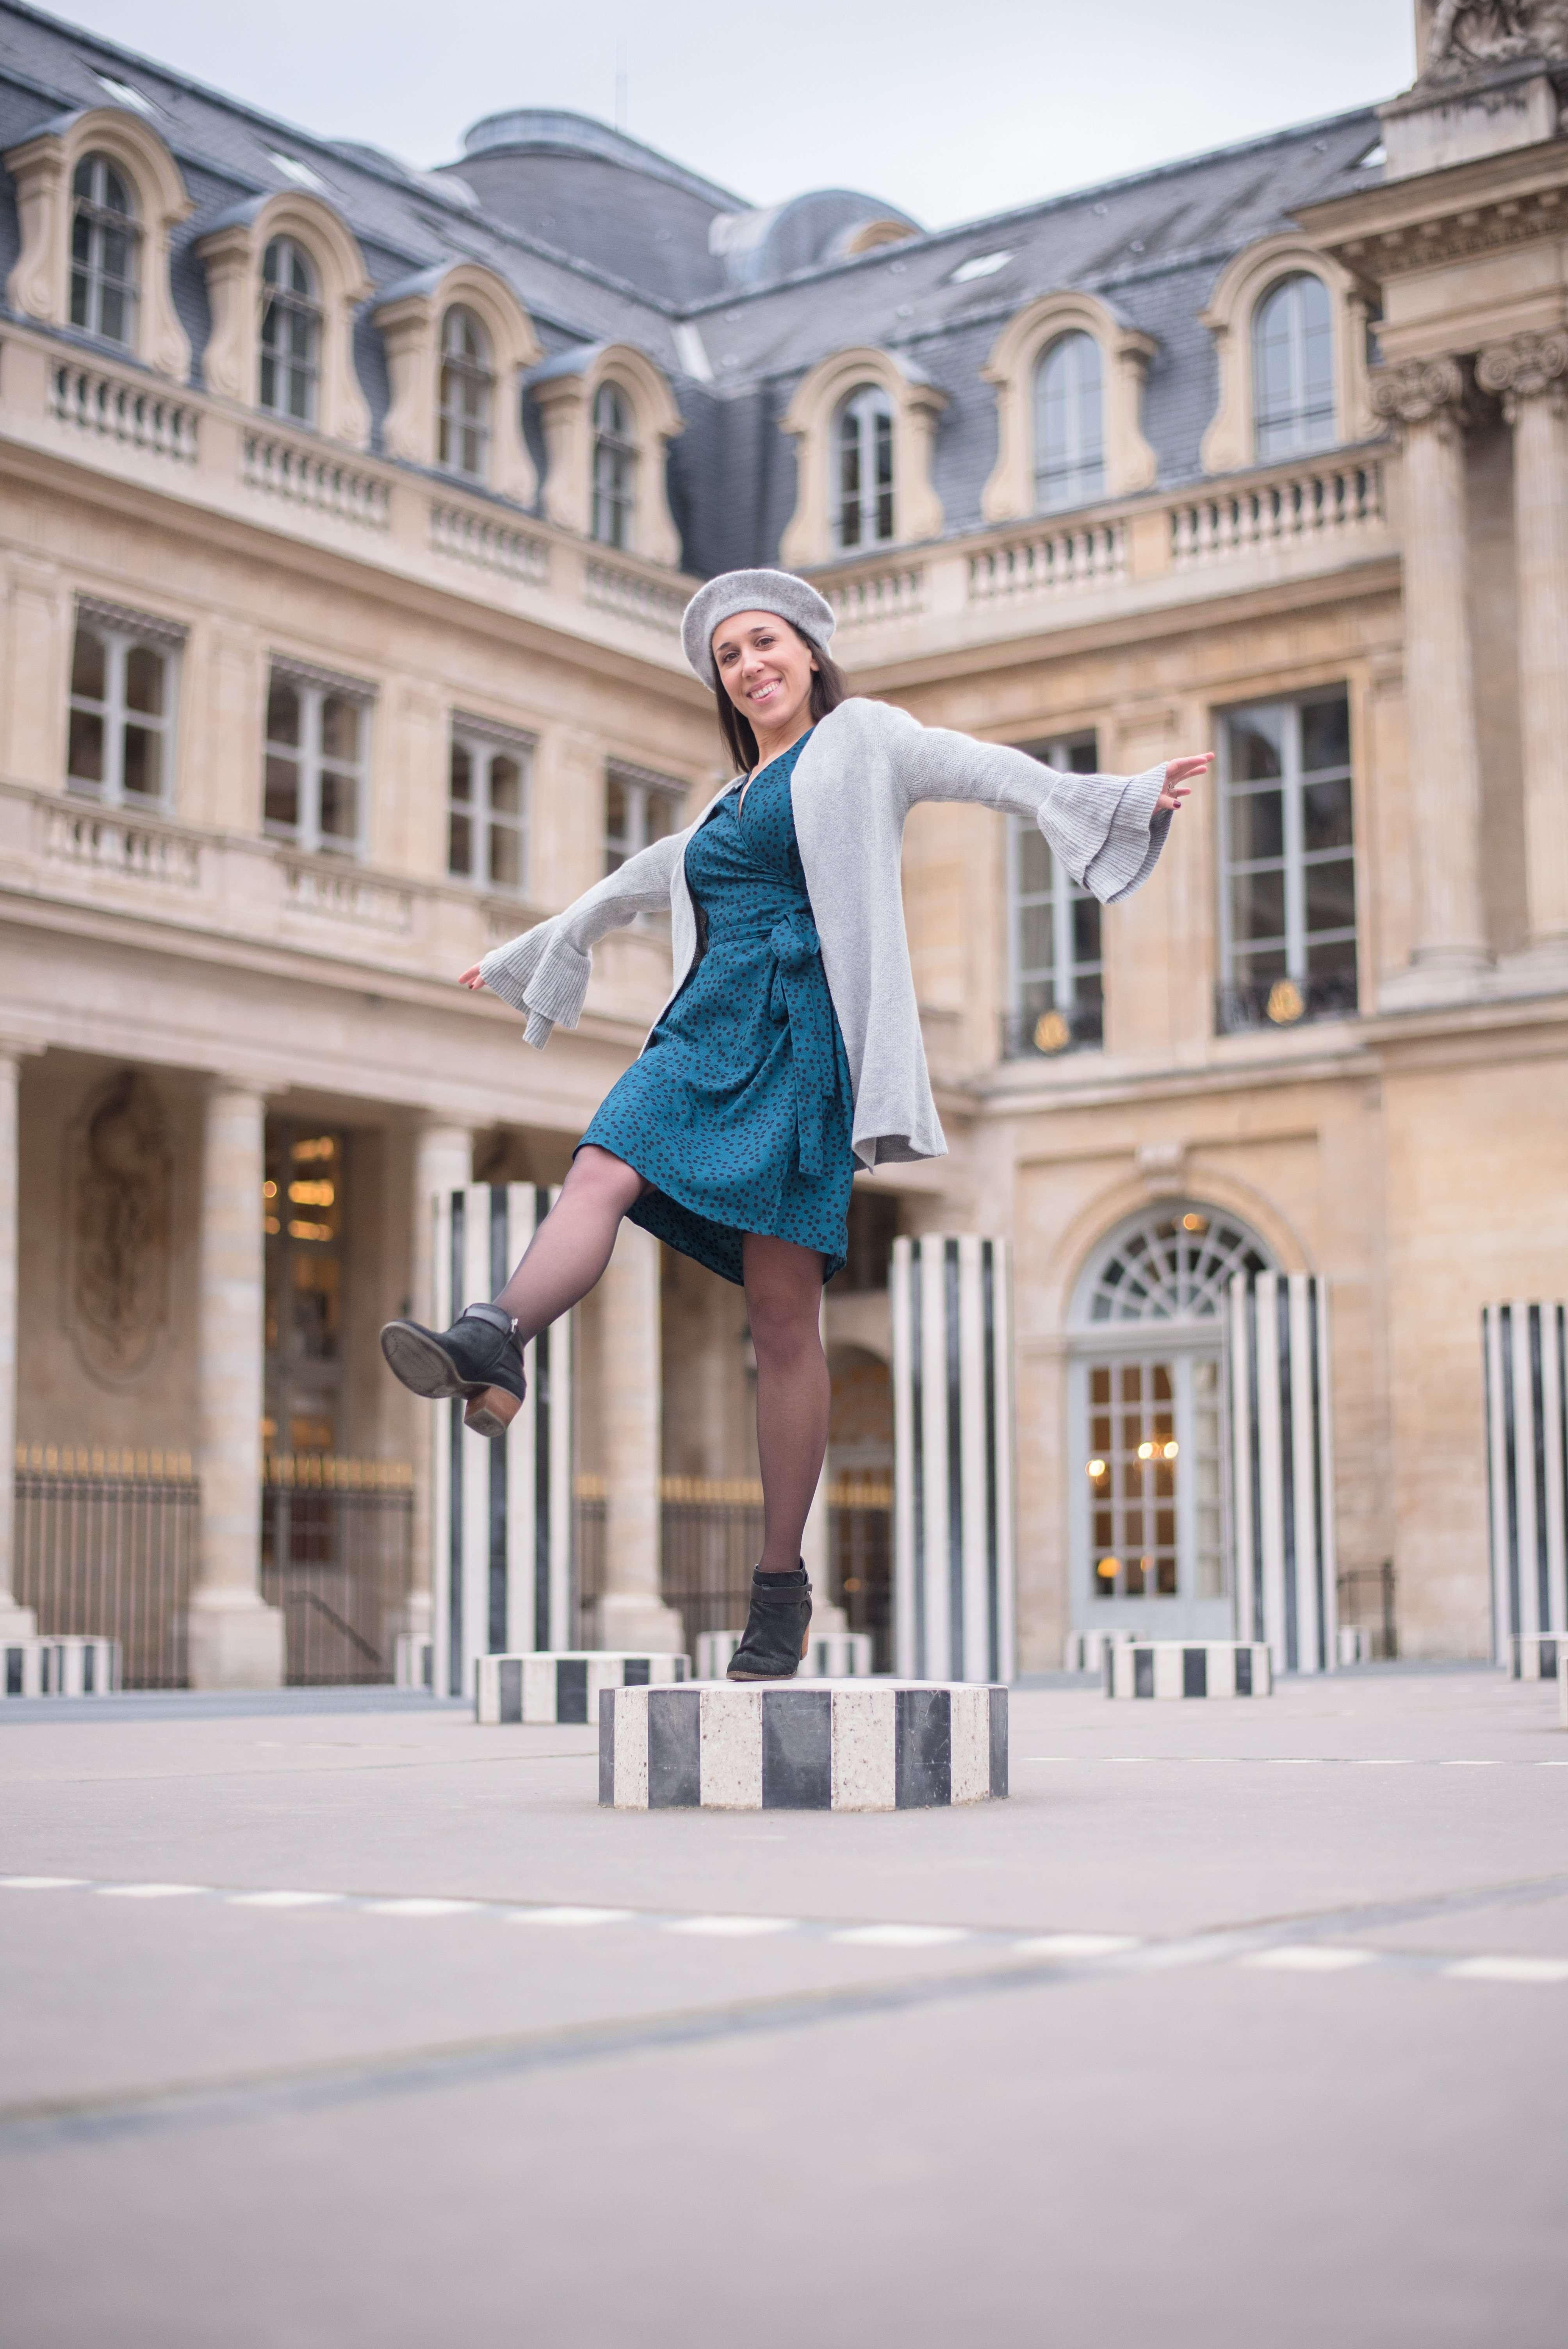 Experimenting with movement at the Palais Royal